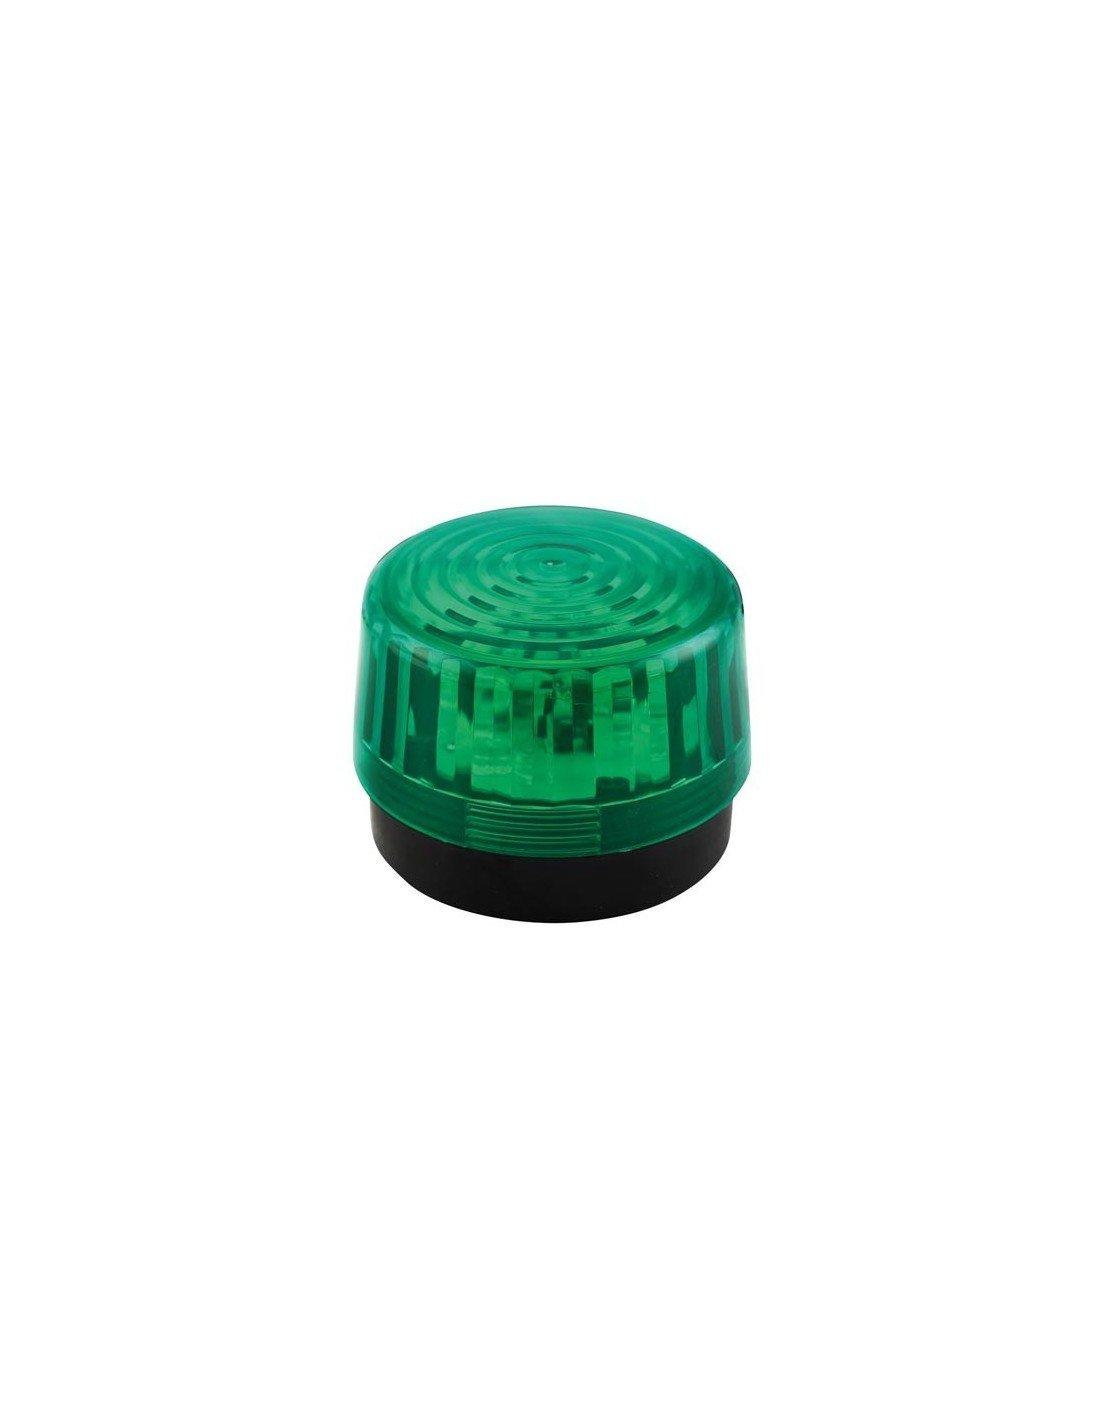 Velleman 640919 LED Blitzlicht, 12 VDC, Grü n HAA100GN